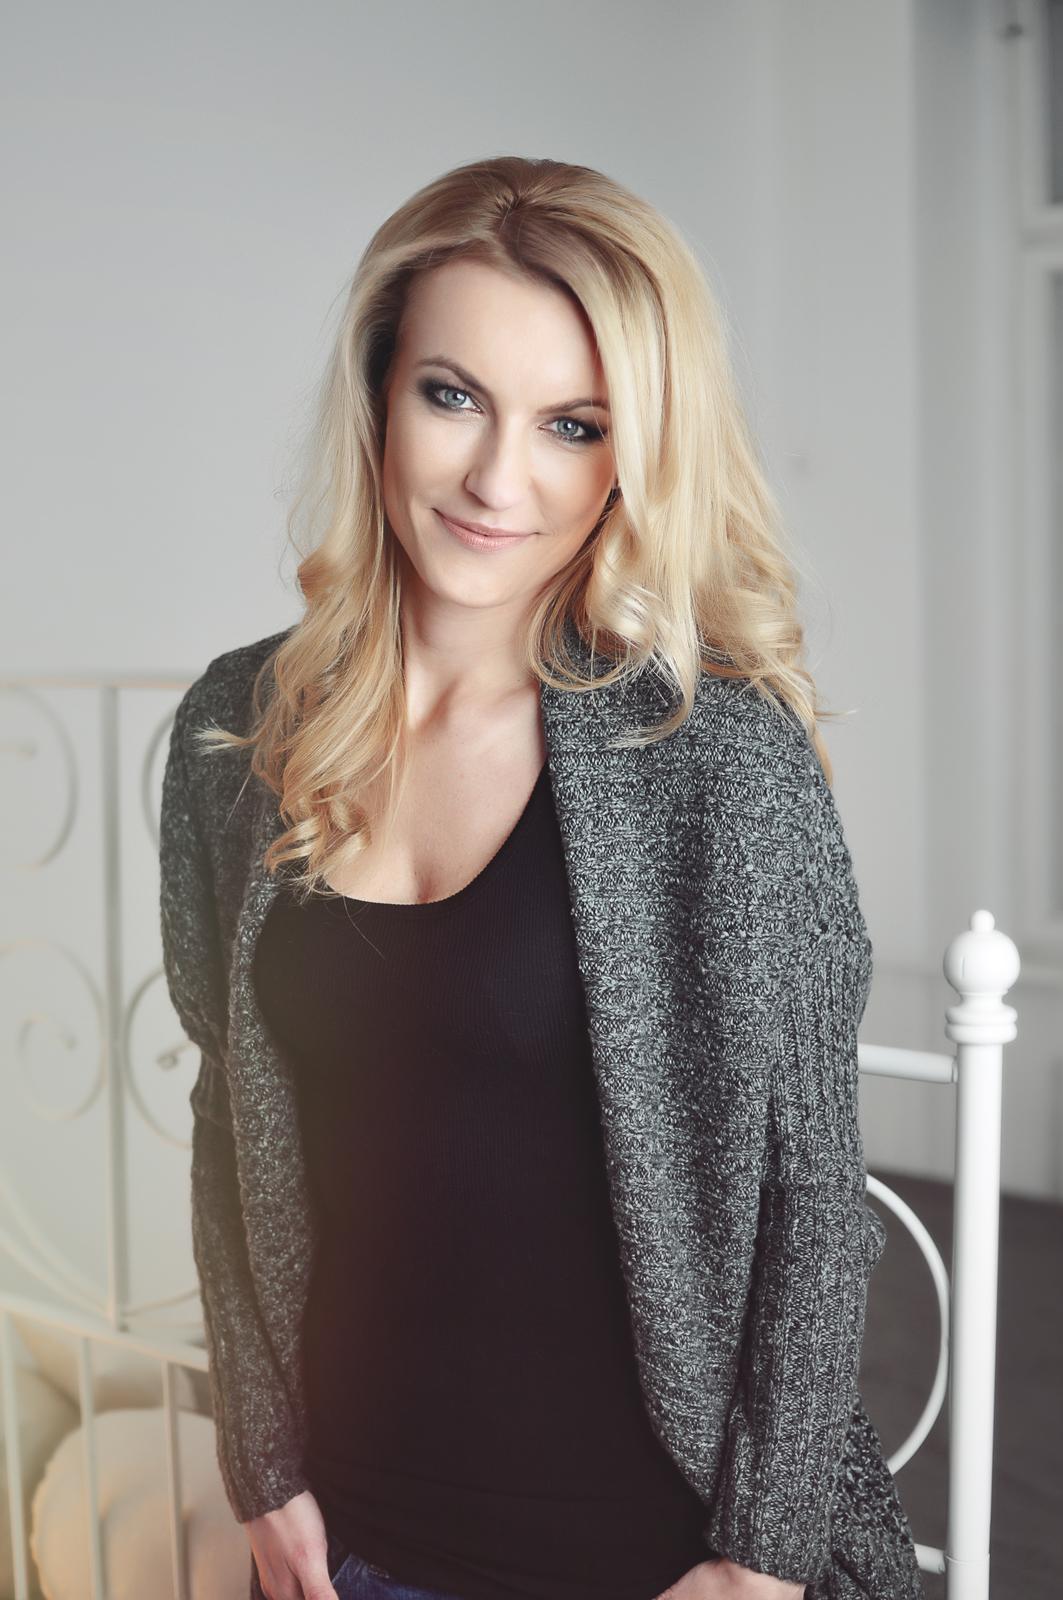 daluc - Make-up: Lucie Vitejčková